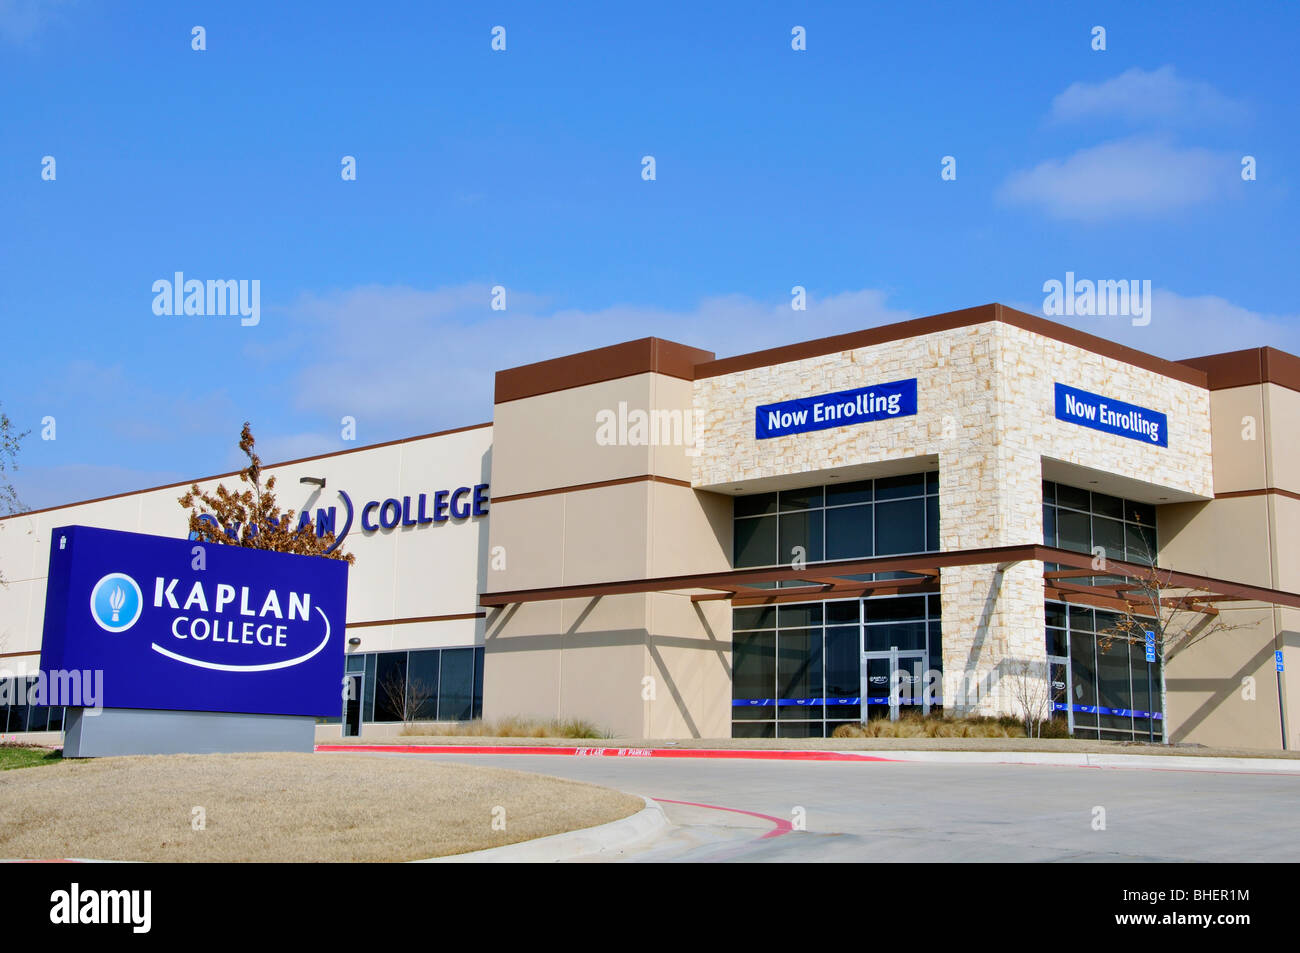 Kaplan College, Texas, USA - Stock Image